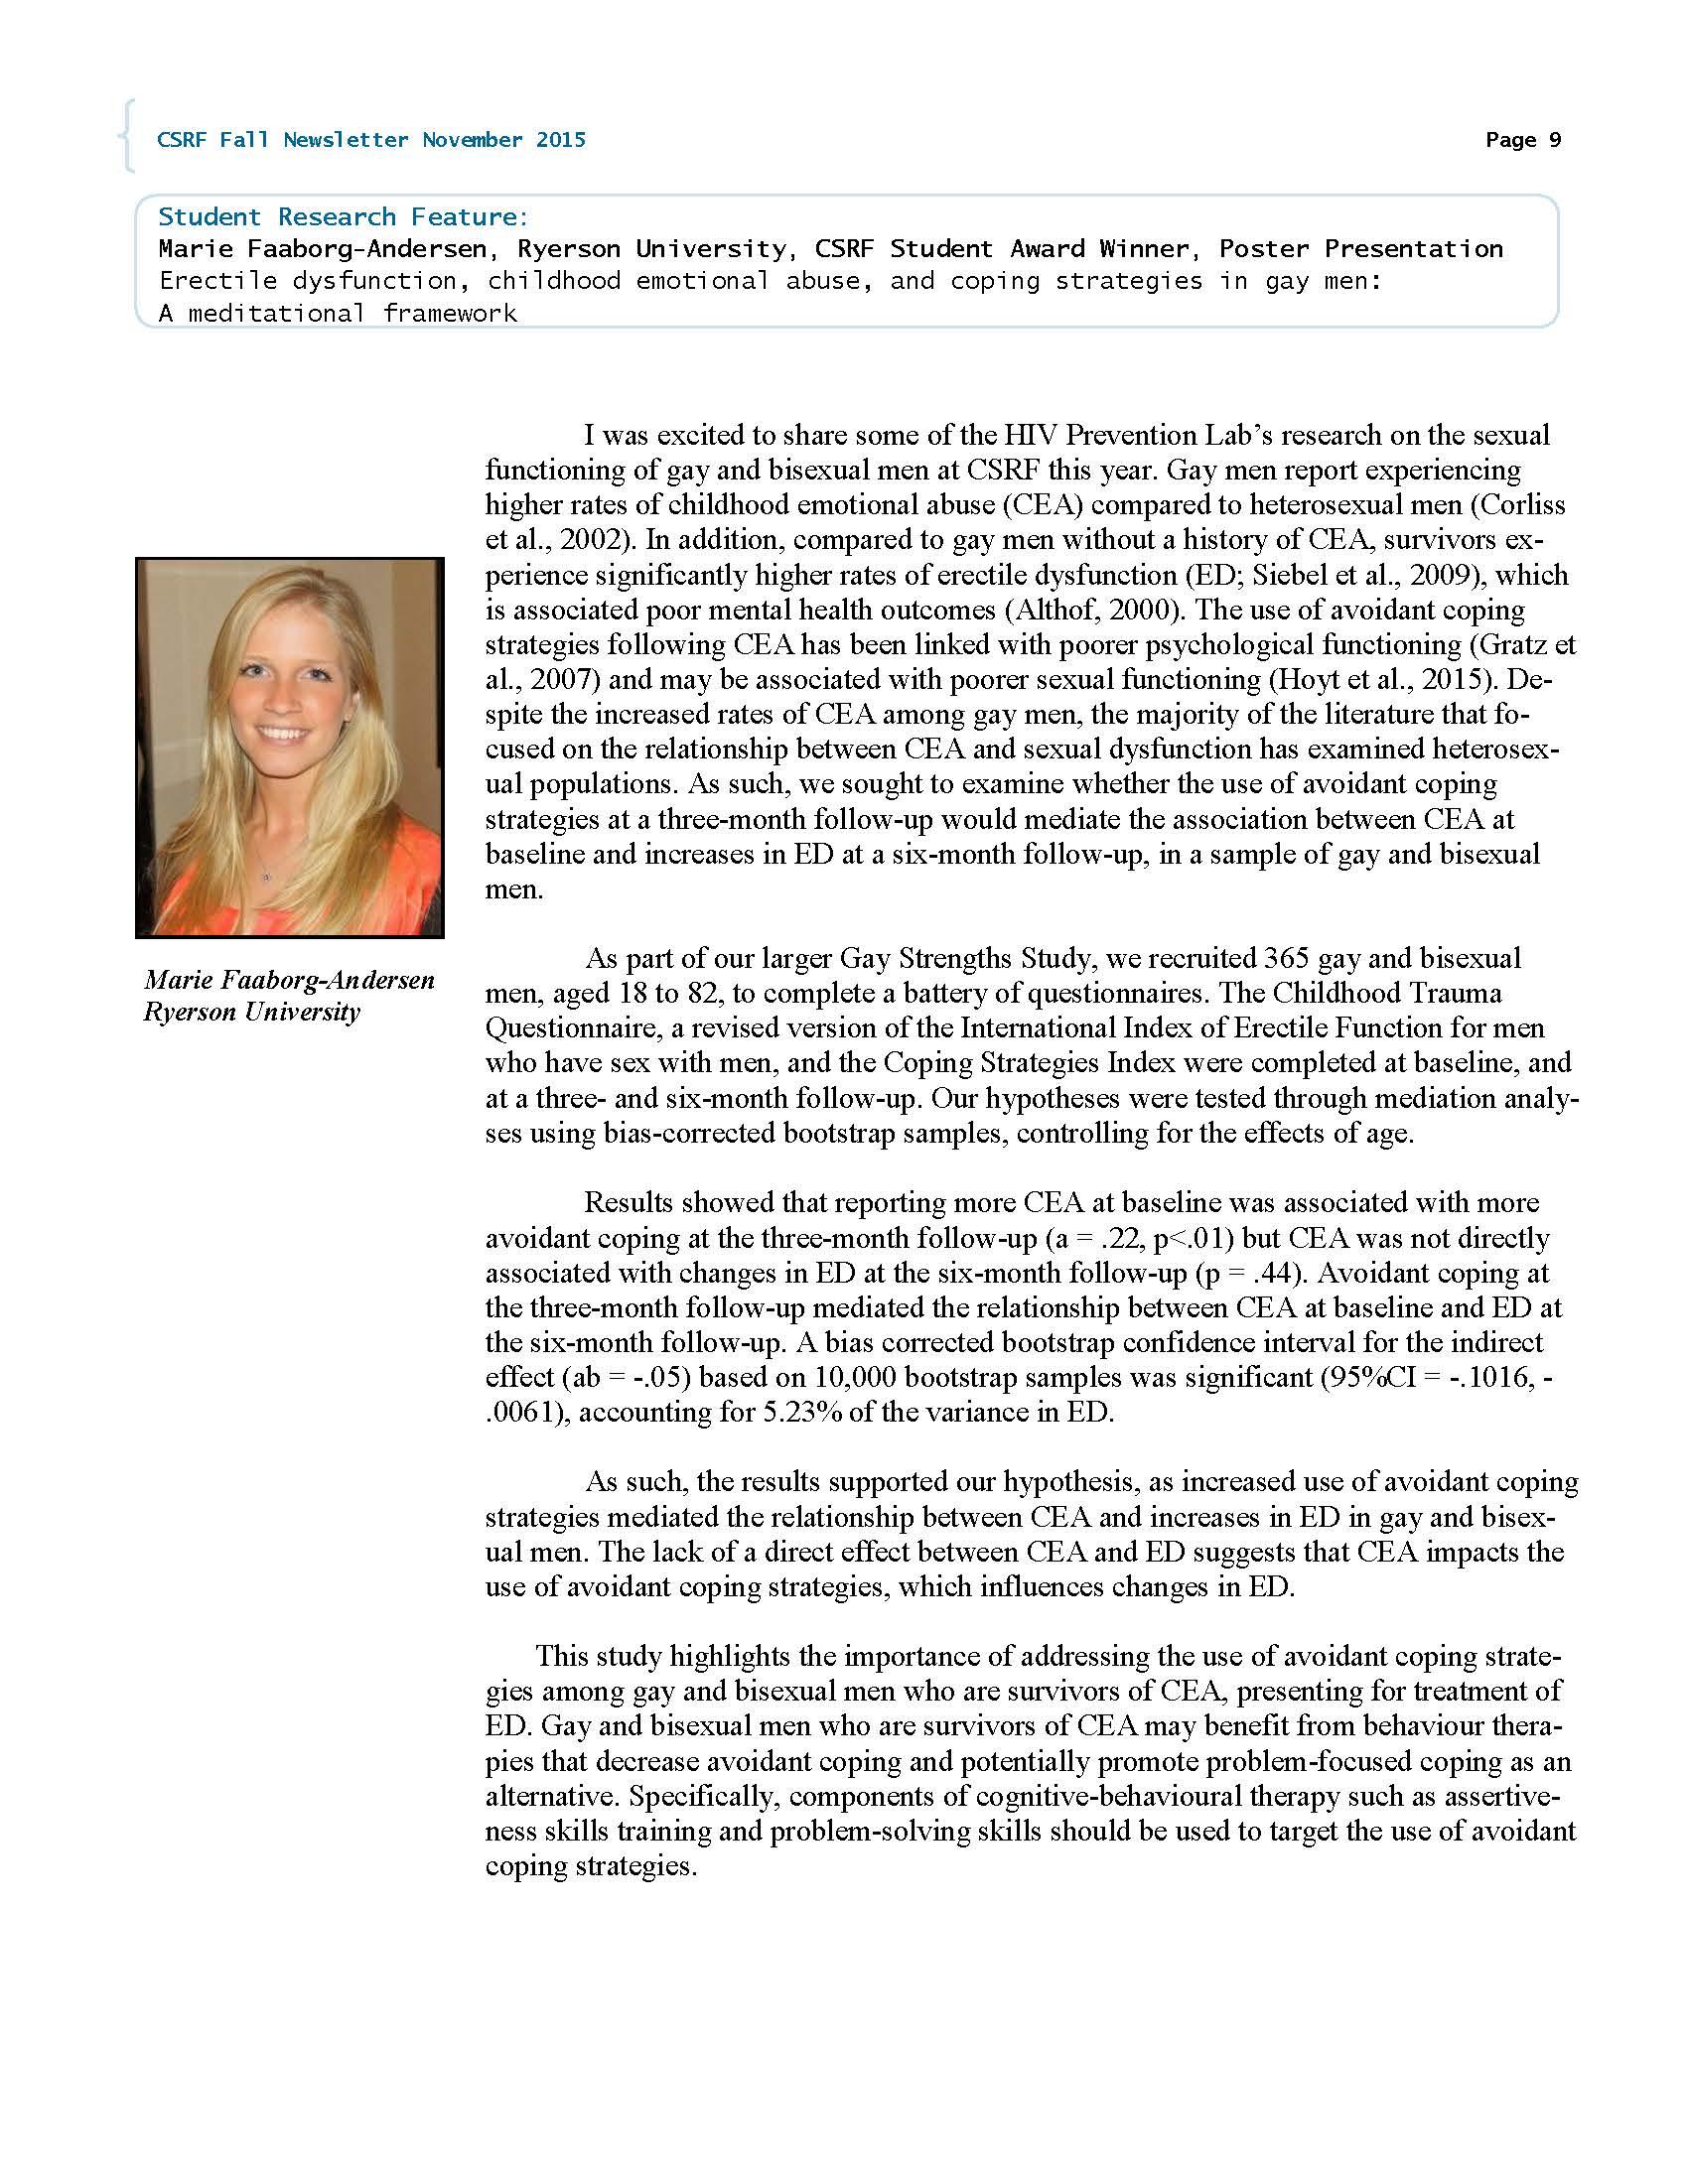 CSRF Fall Newsletter 2015_Page_09.jpg